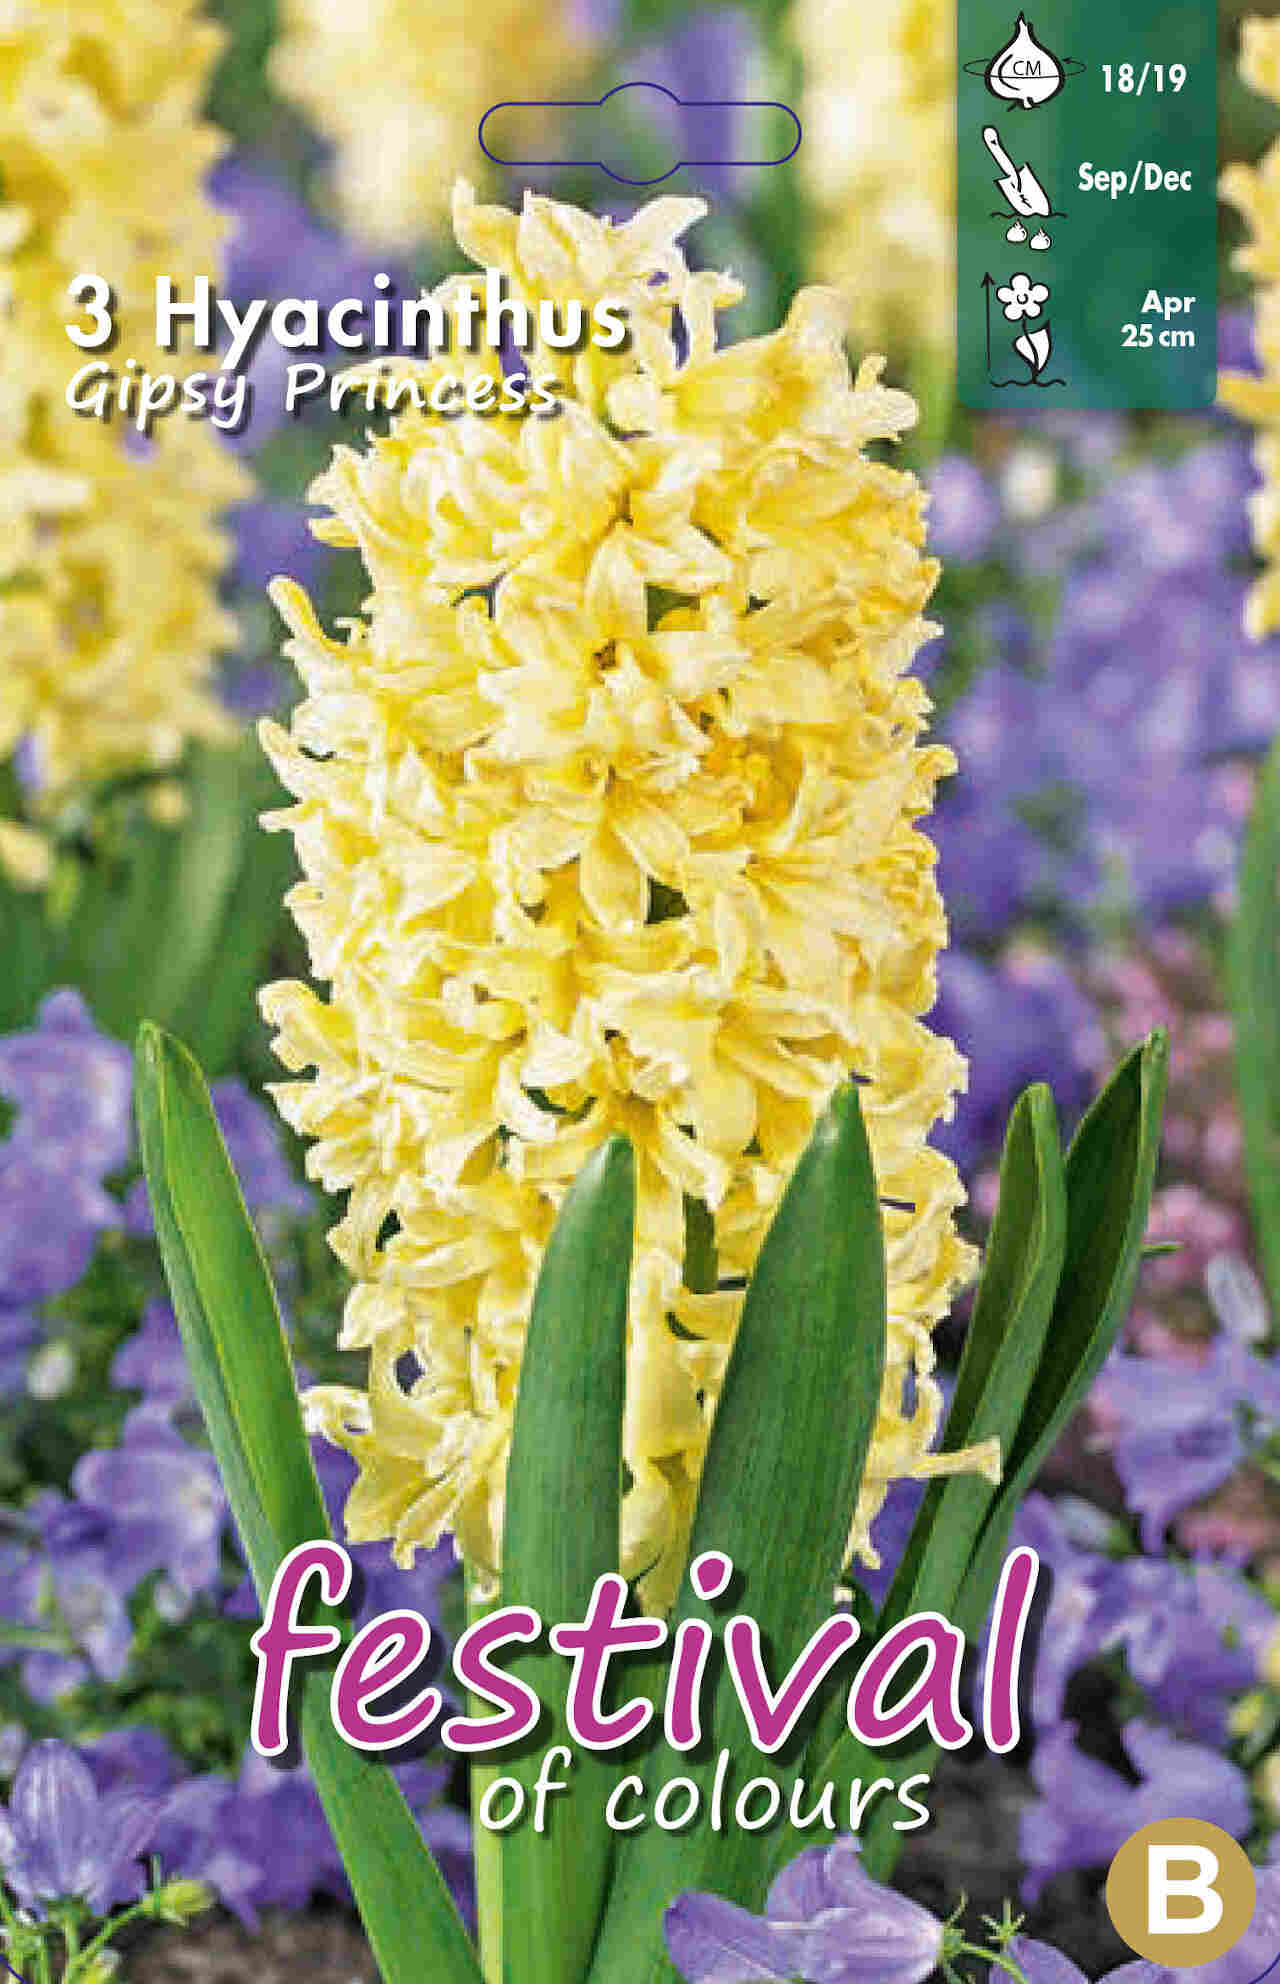 Hyacint - Hyacinthus Gipsy Princess 18/19